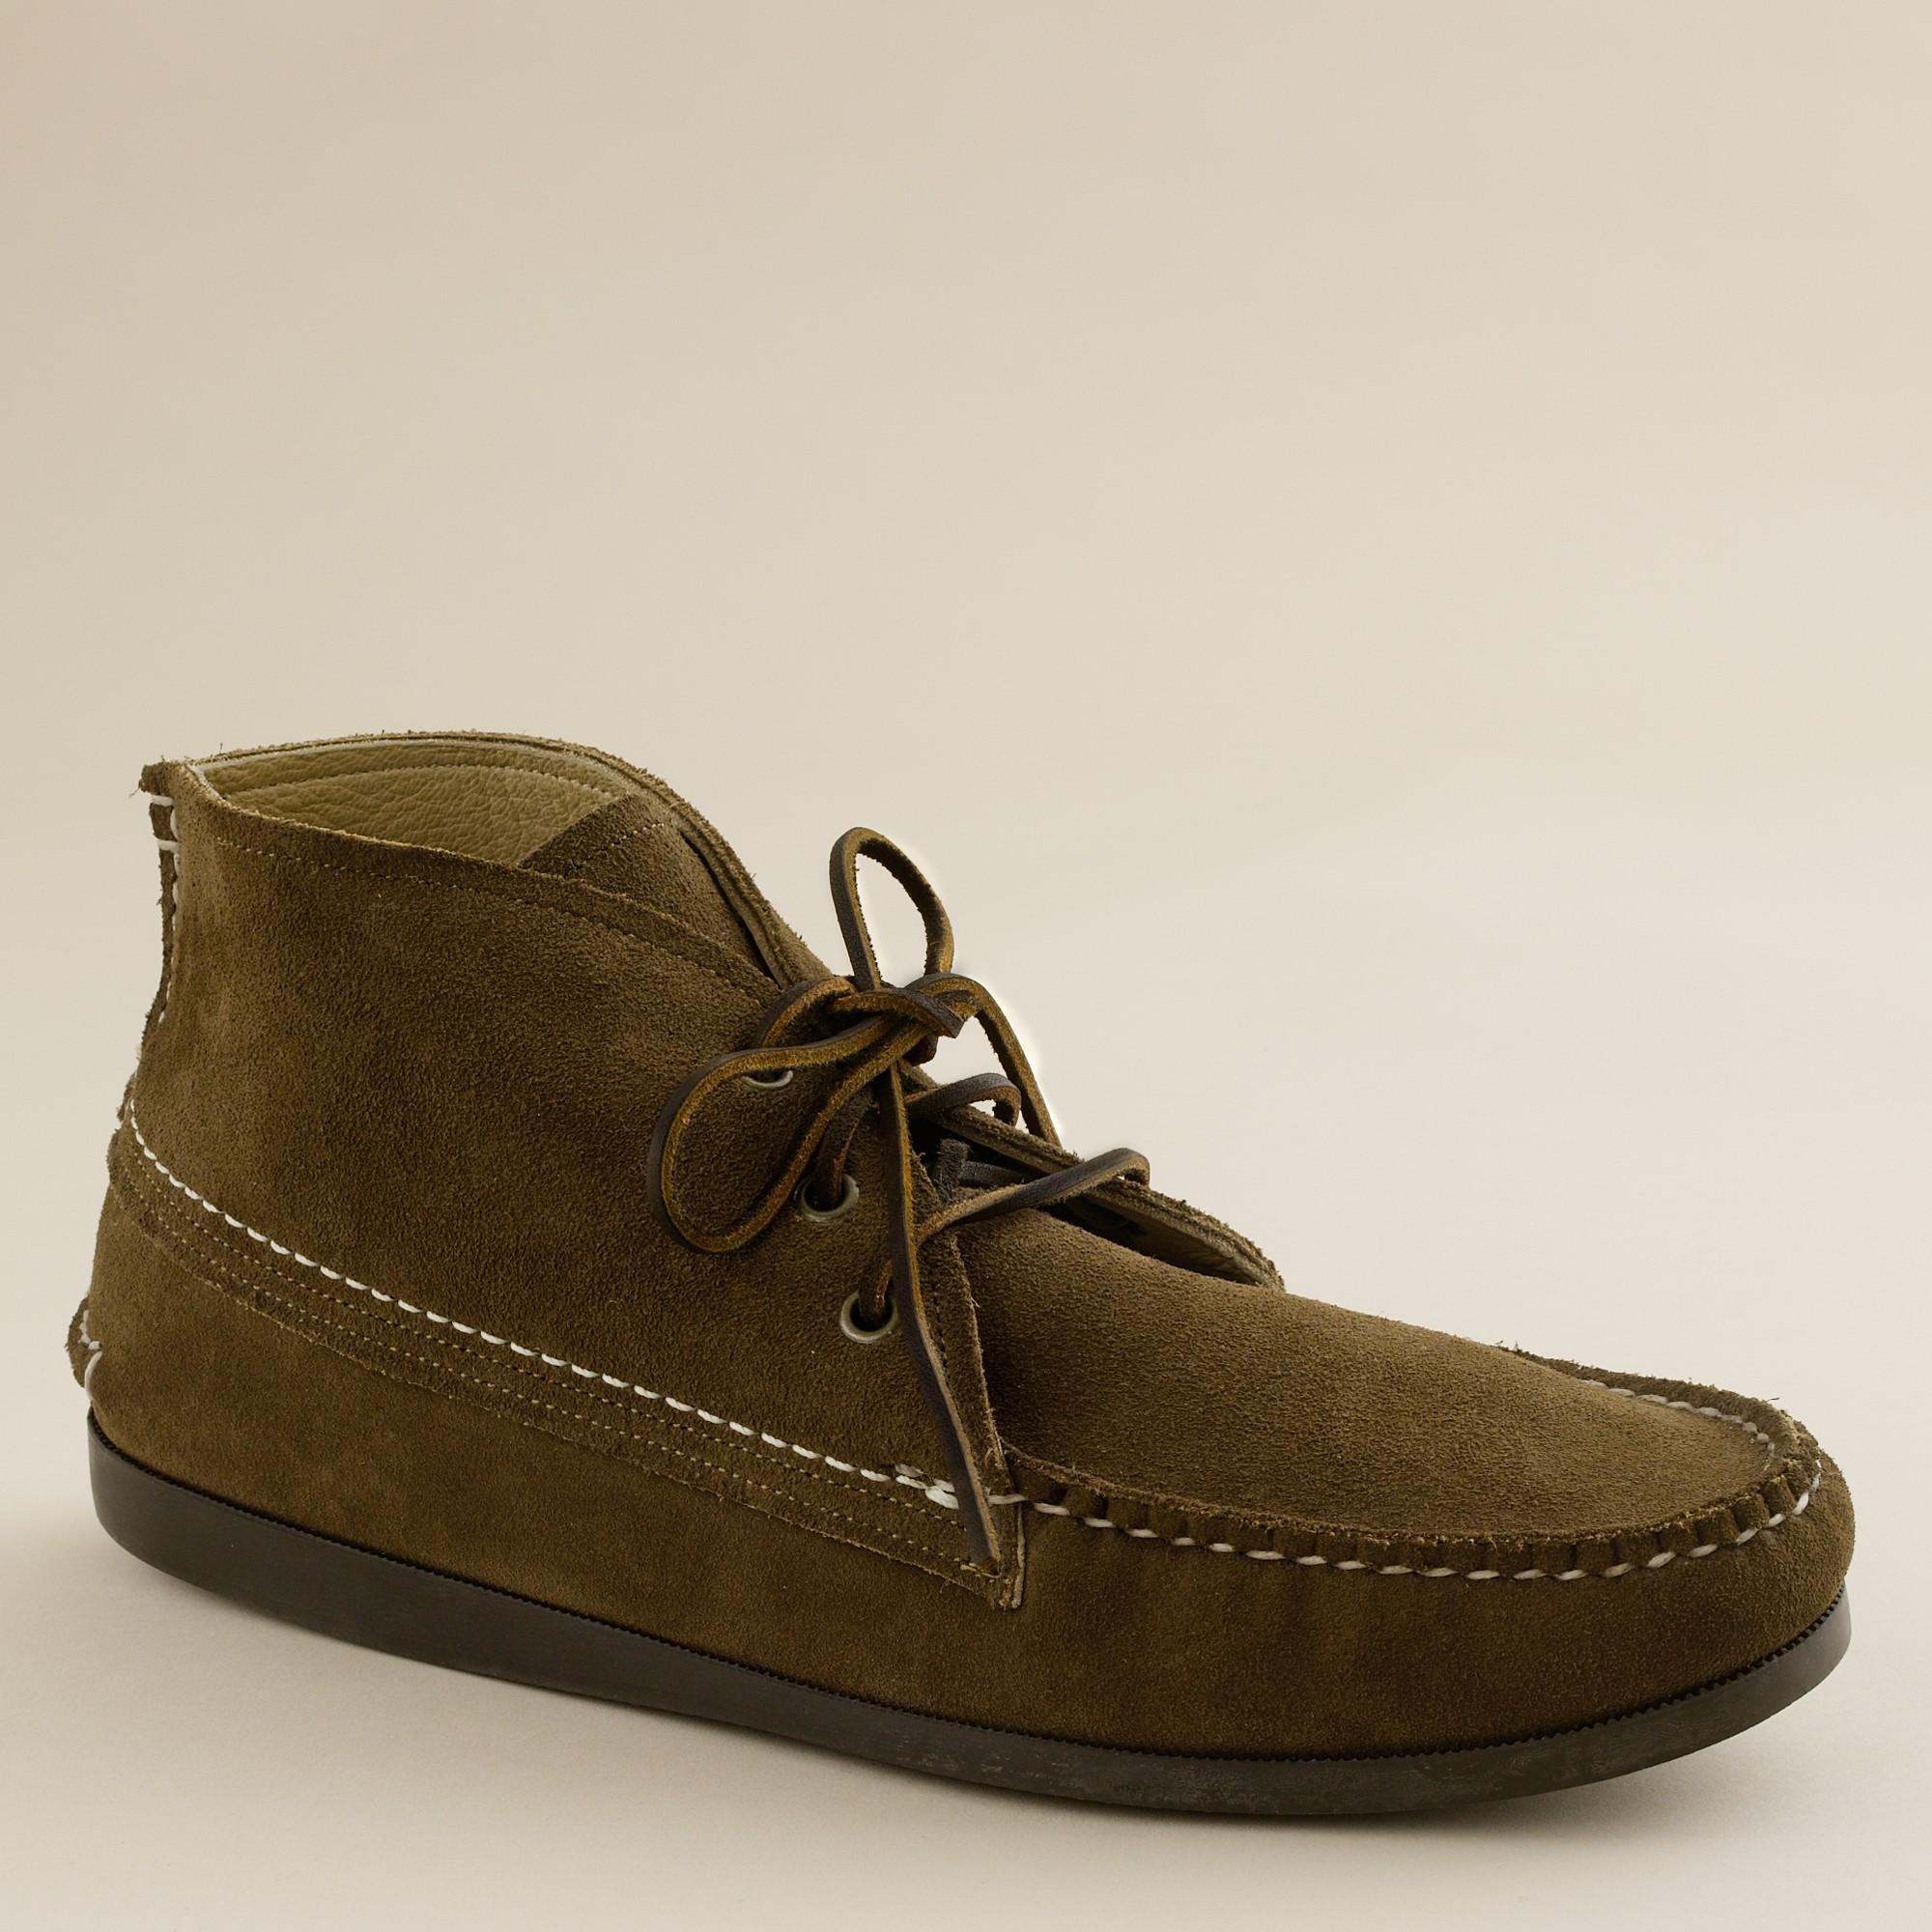 Jcrew Mens Quoddyr Suede Chukka Boots In Brown For Men